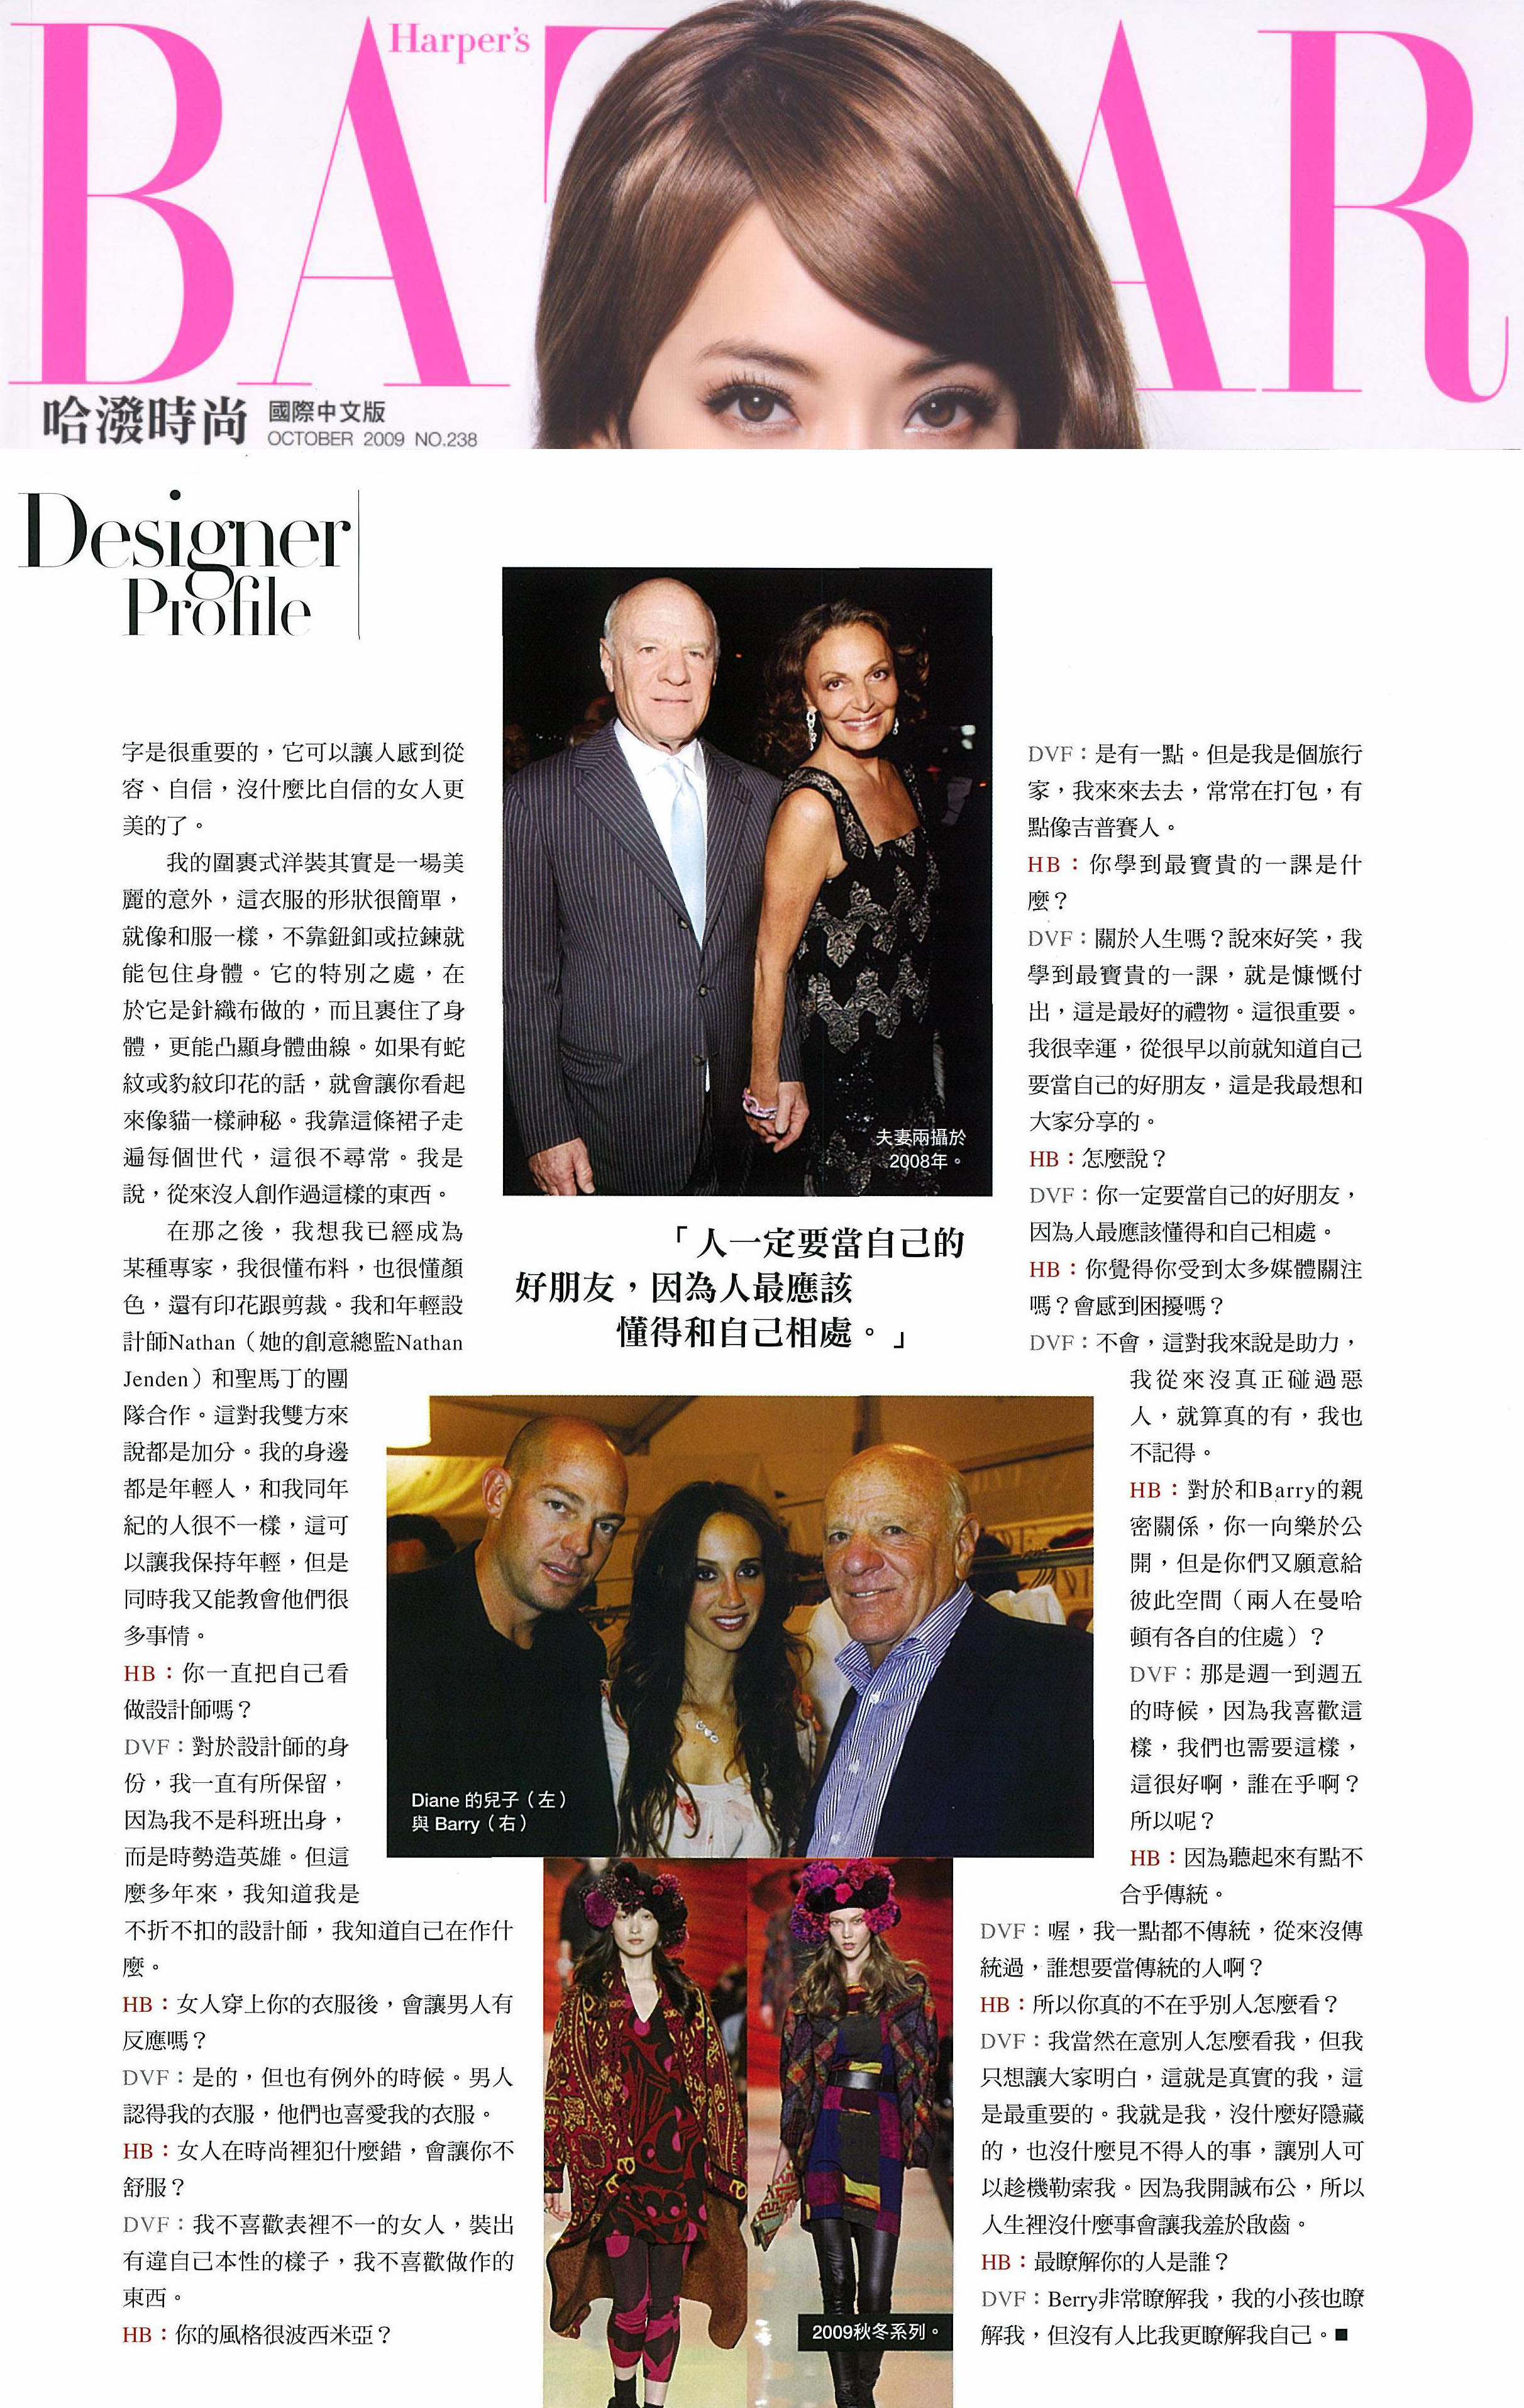 Harper's Bazaar Taiwan 05, October 2009.JPG